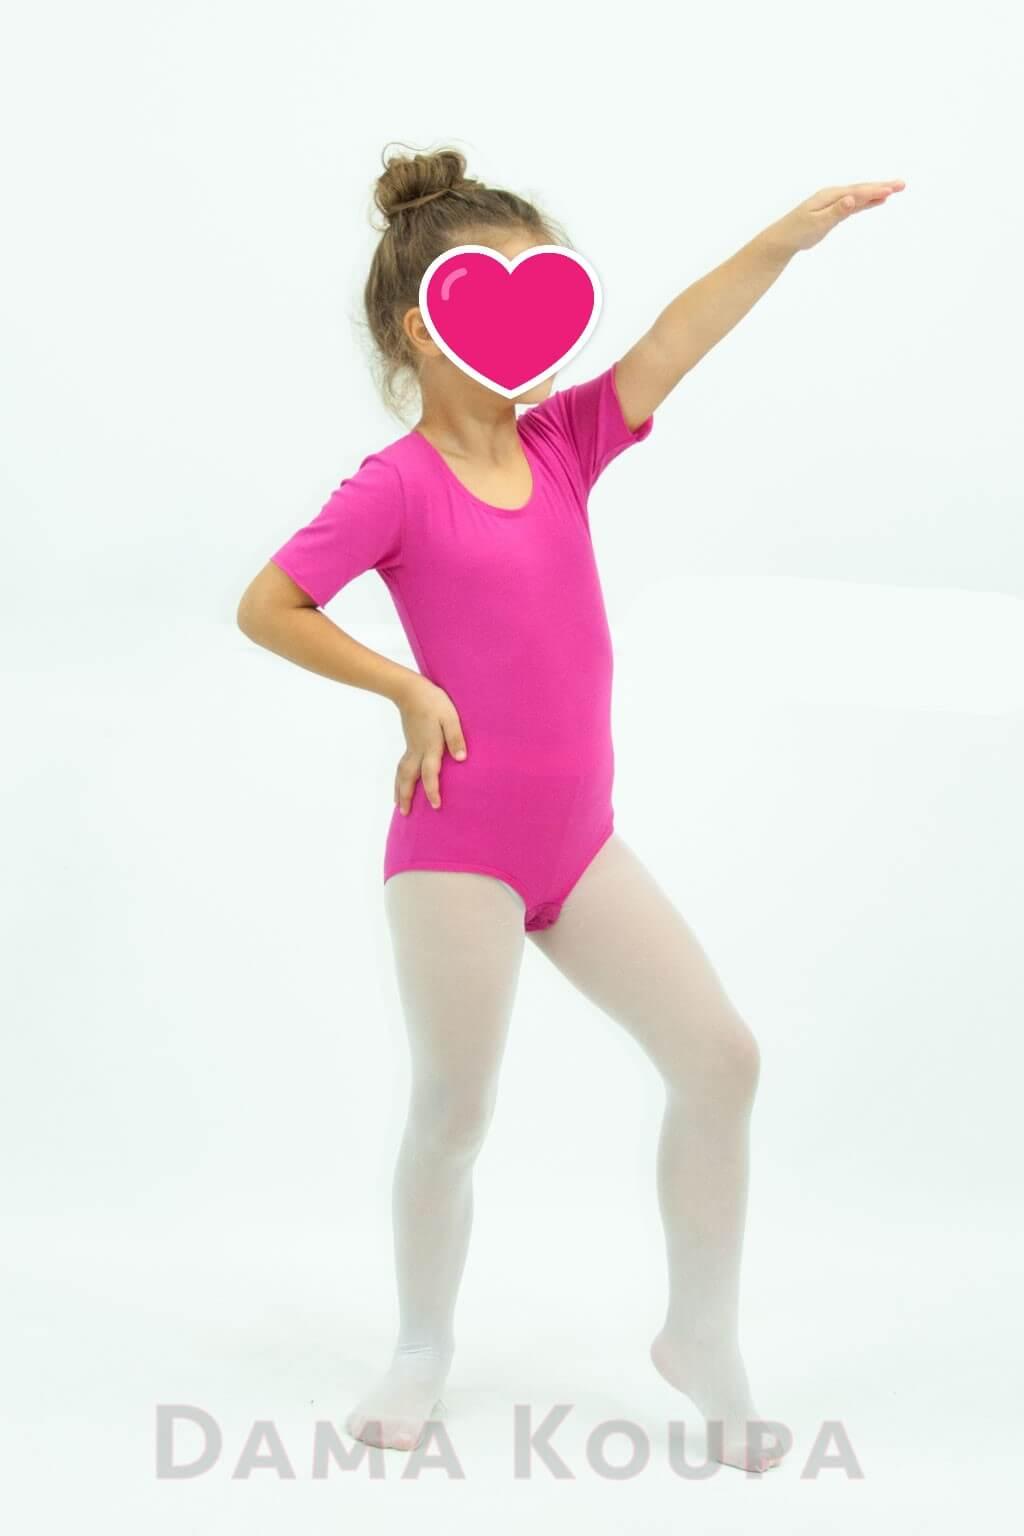 fe57fe7ead4 Παιδικό κορμάκι γυμναστικής με κοντό μανίκι Dama Koupa